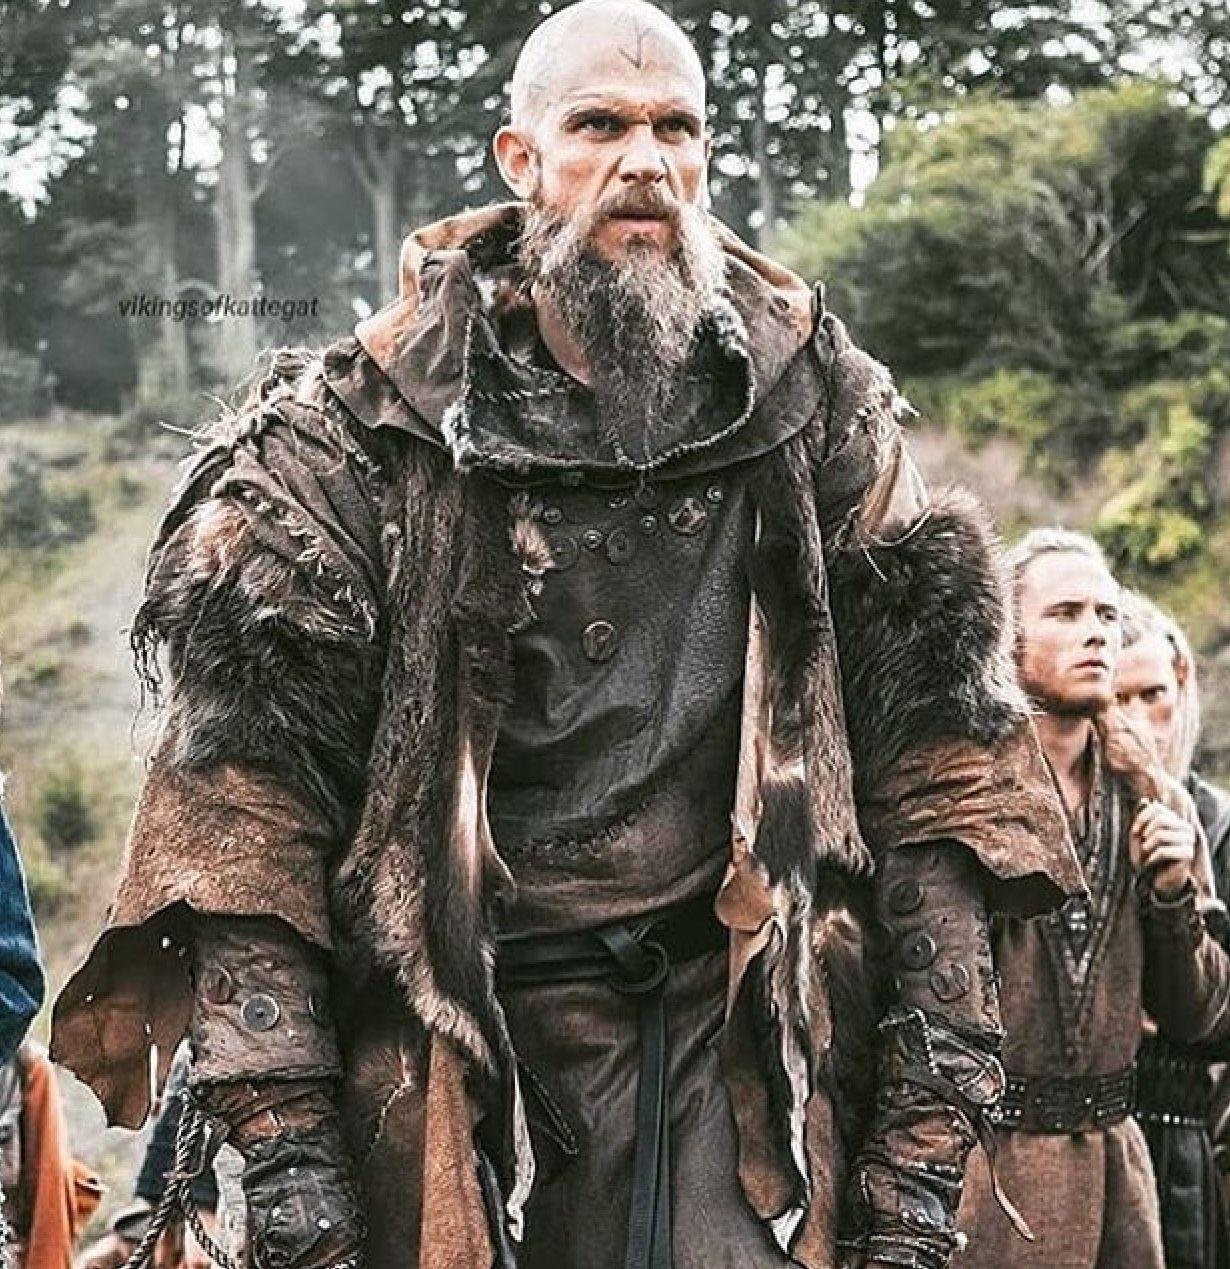 Sigurd Orm-I-Auga Ragnarsson